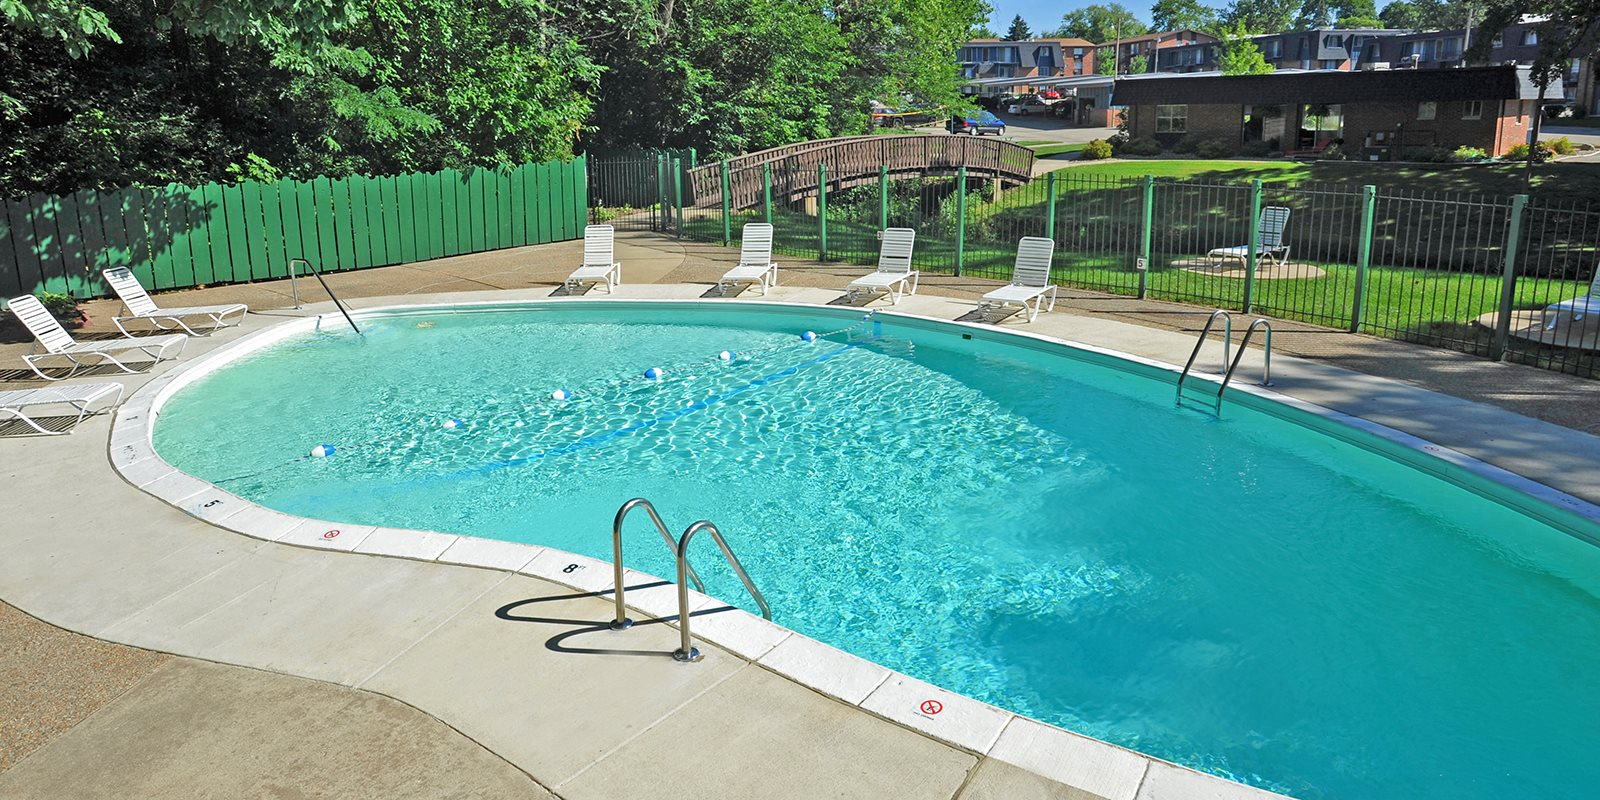 Outdoor swimming pool at Timberbrook Apartments, Peoria